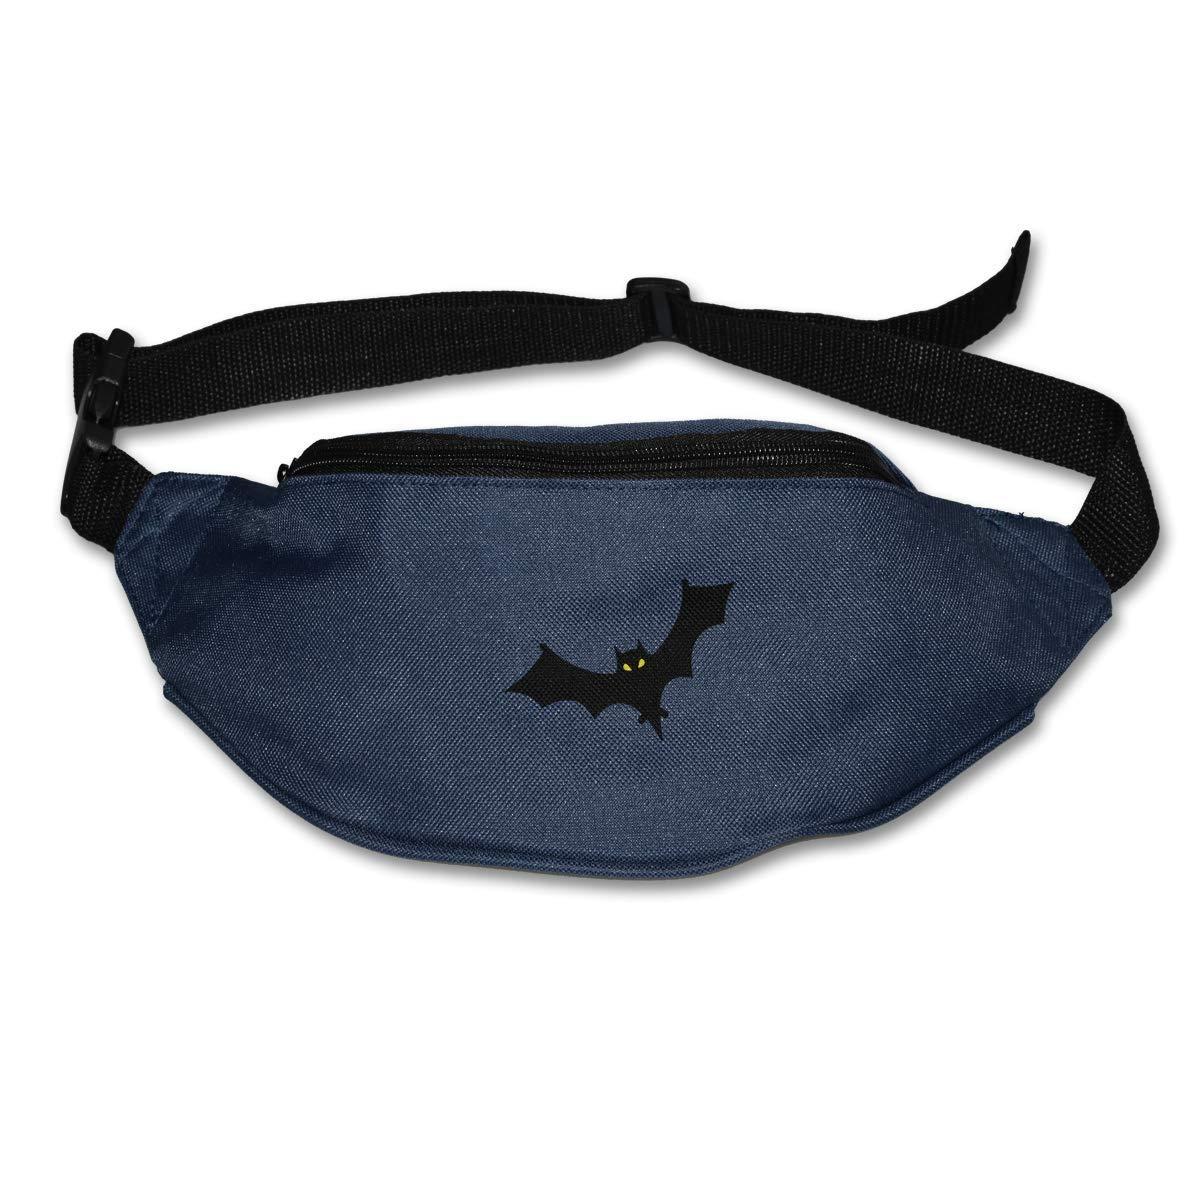 Bat Canvas Running Waist Pack Bag Travel Sports Money Holder for Hiking